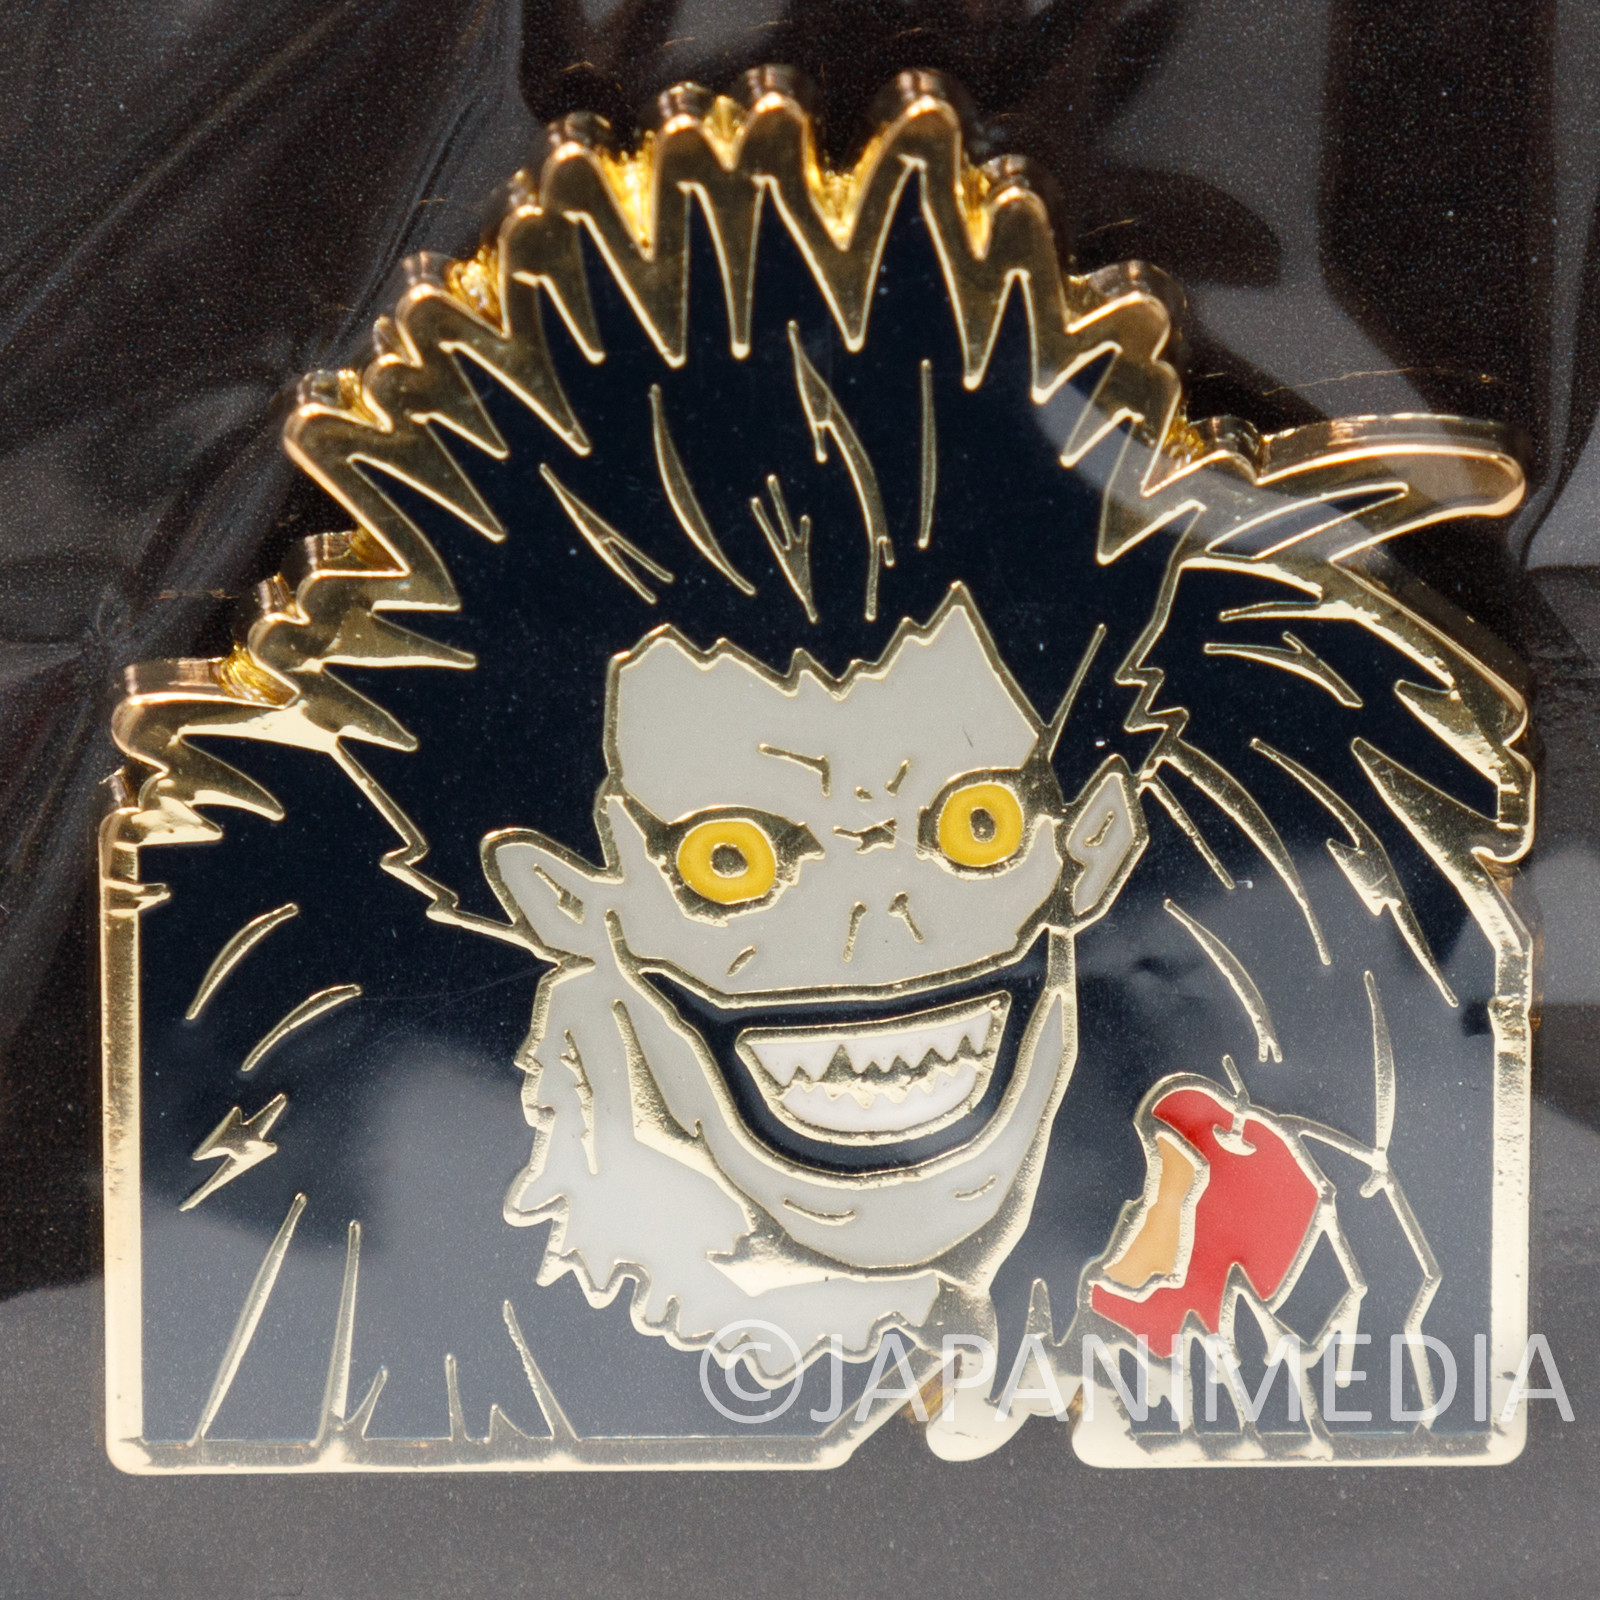 Death Note Ryuk Metal Pins JAPAN ANIME MANGA 2